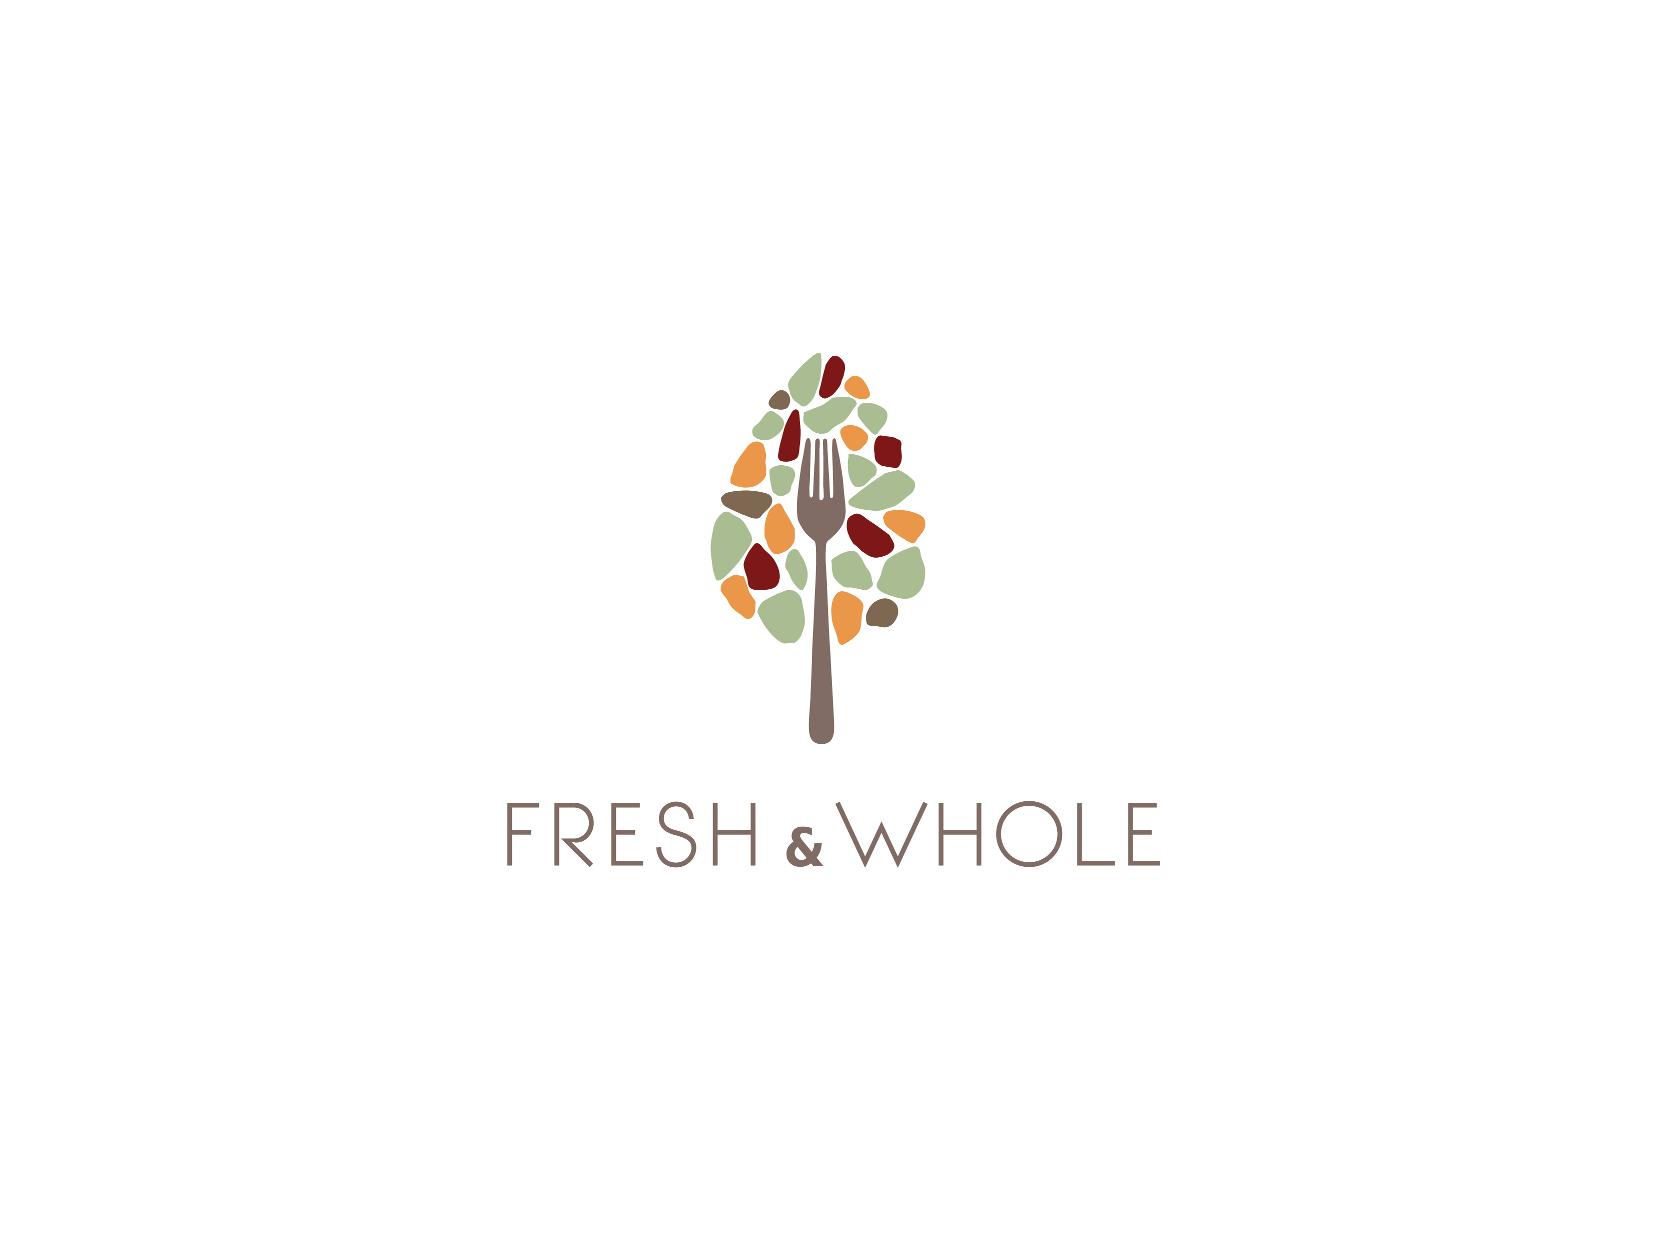 Create logo for FreshandWhole.Com  (FOOD related!)